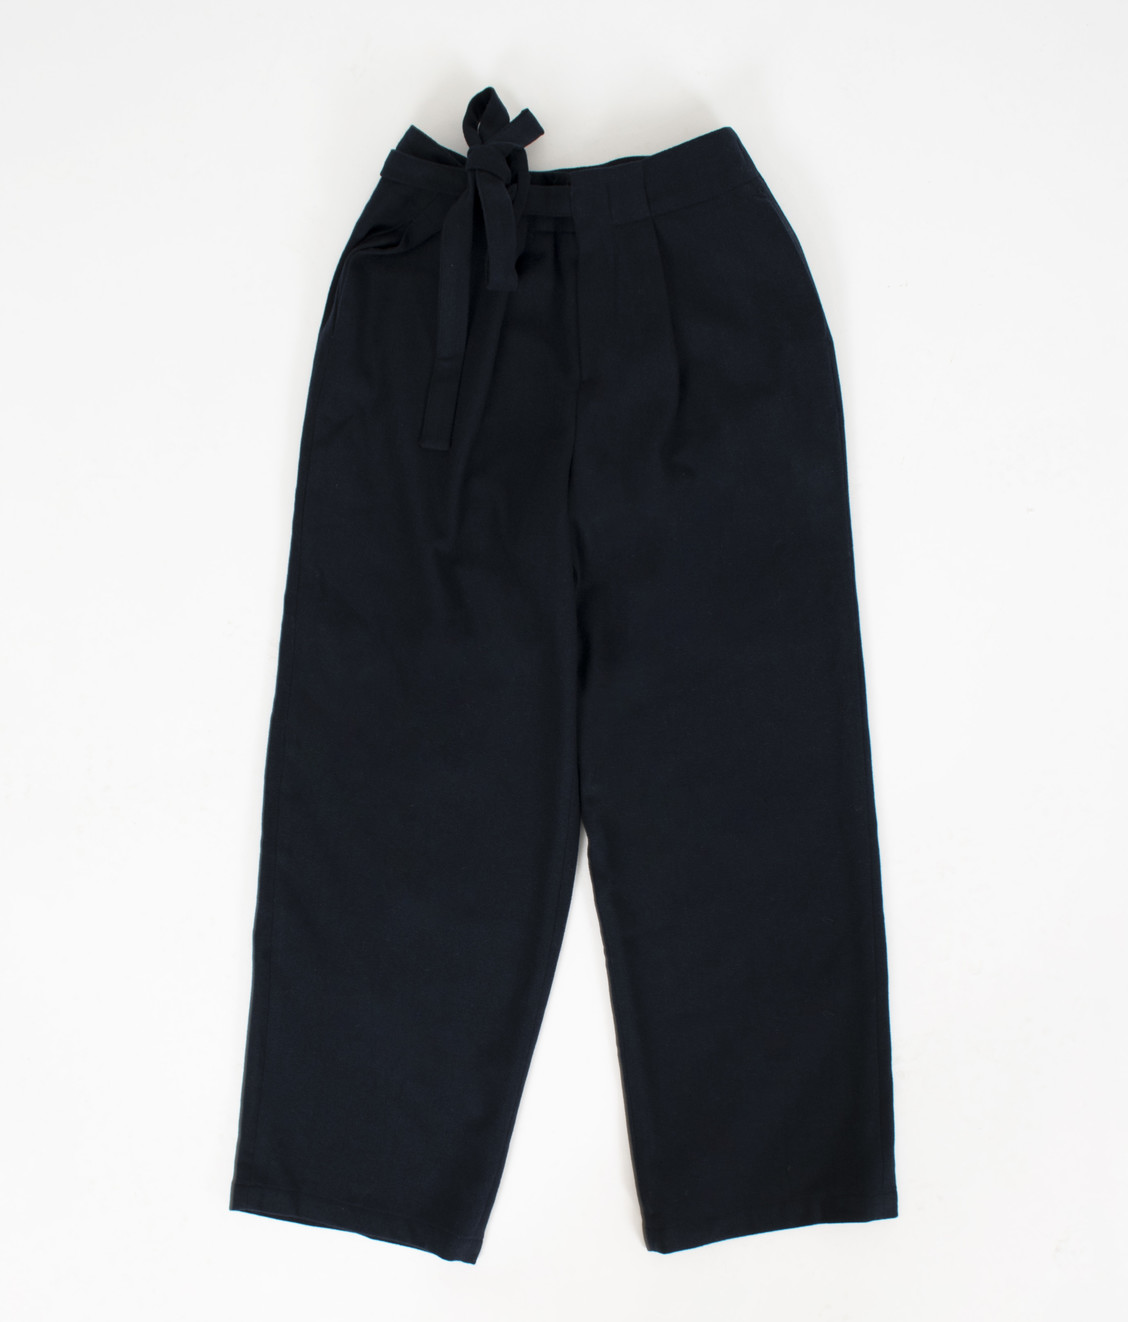 NEUL Neul Strap Wool Pants Dark Navy